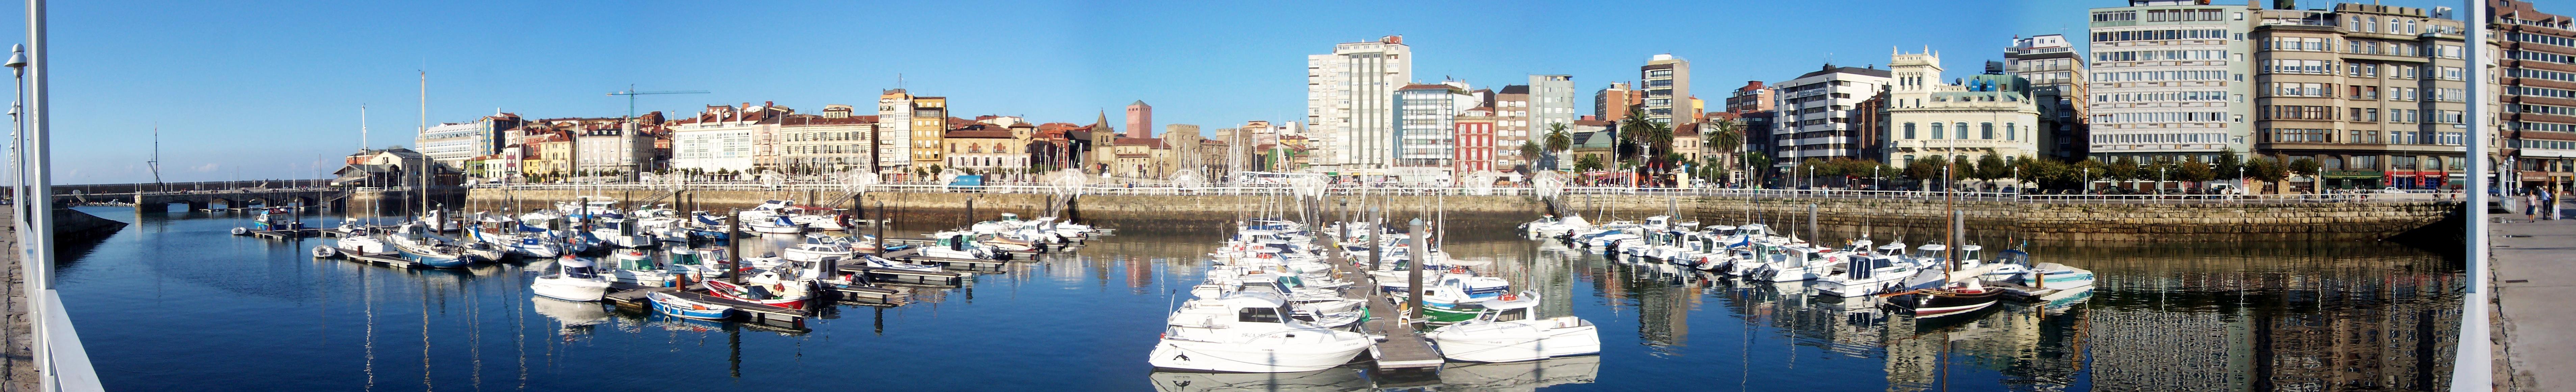 http://upload.wikimedia.org/wikipedia/commons/b/bf/Gijon_puerto_deportivo_12-09-2005.jpg